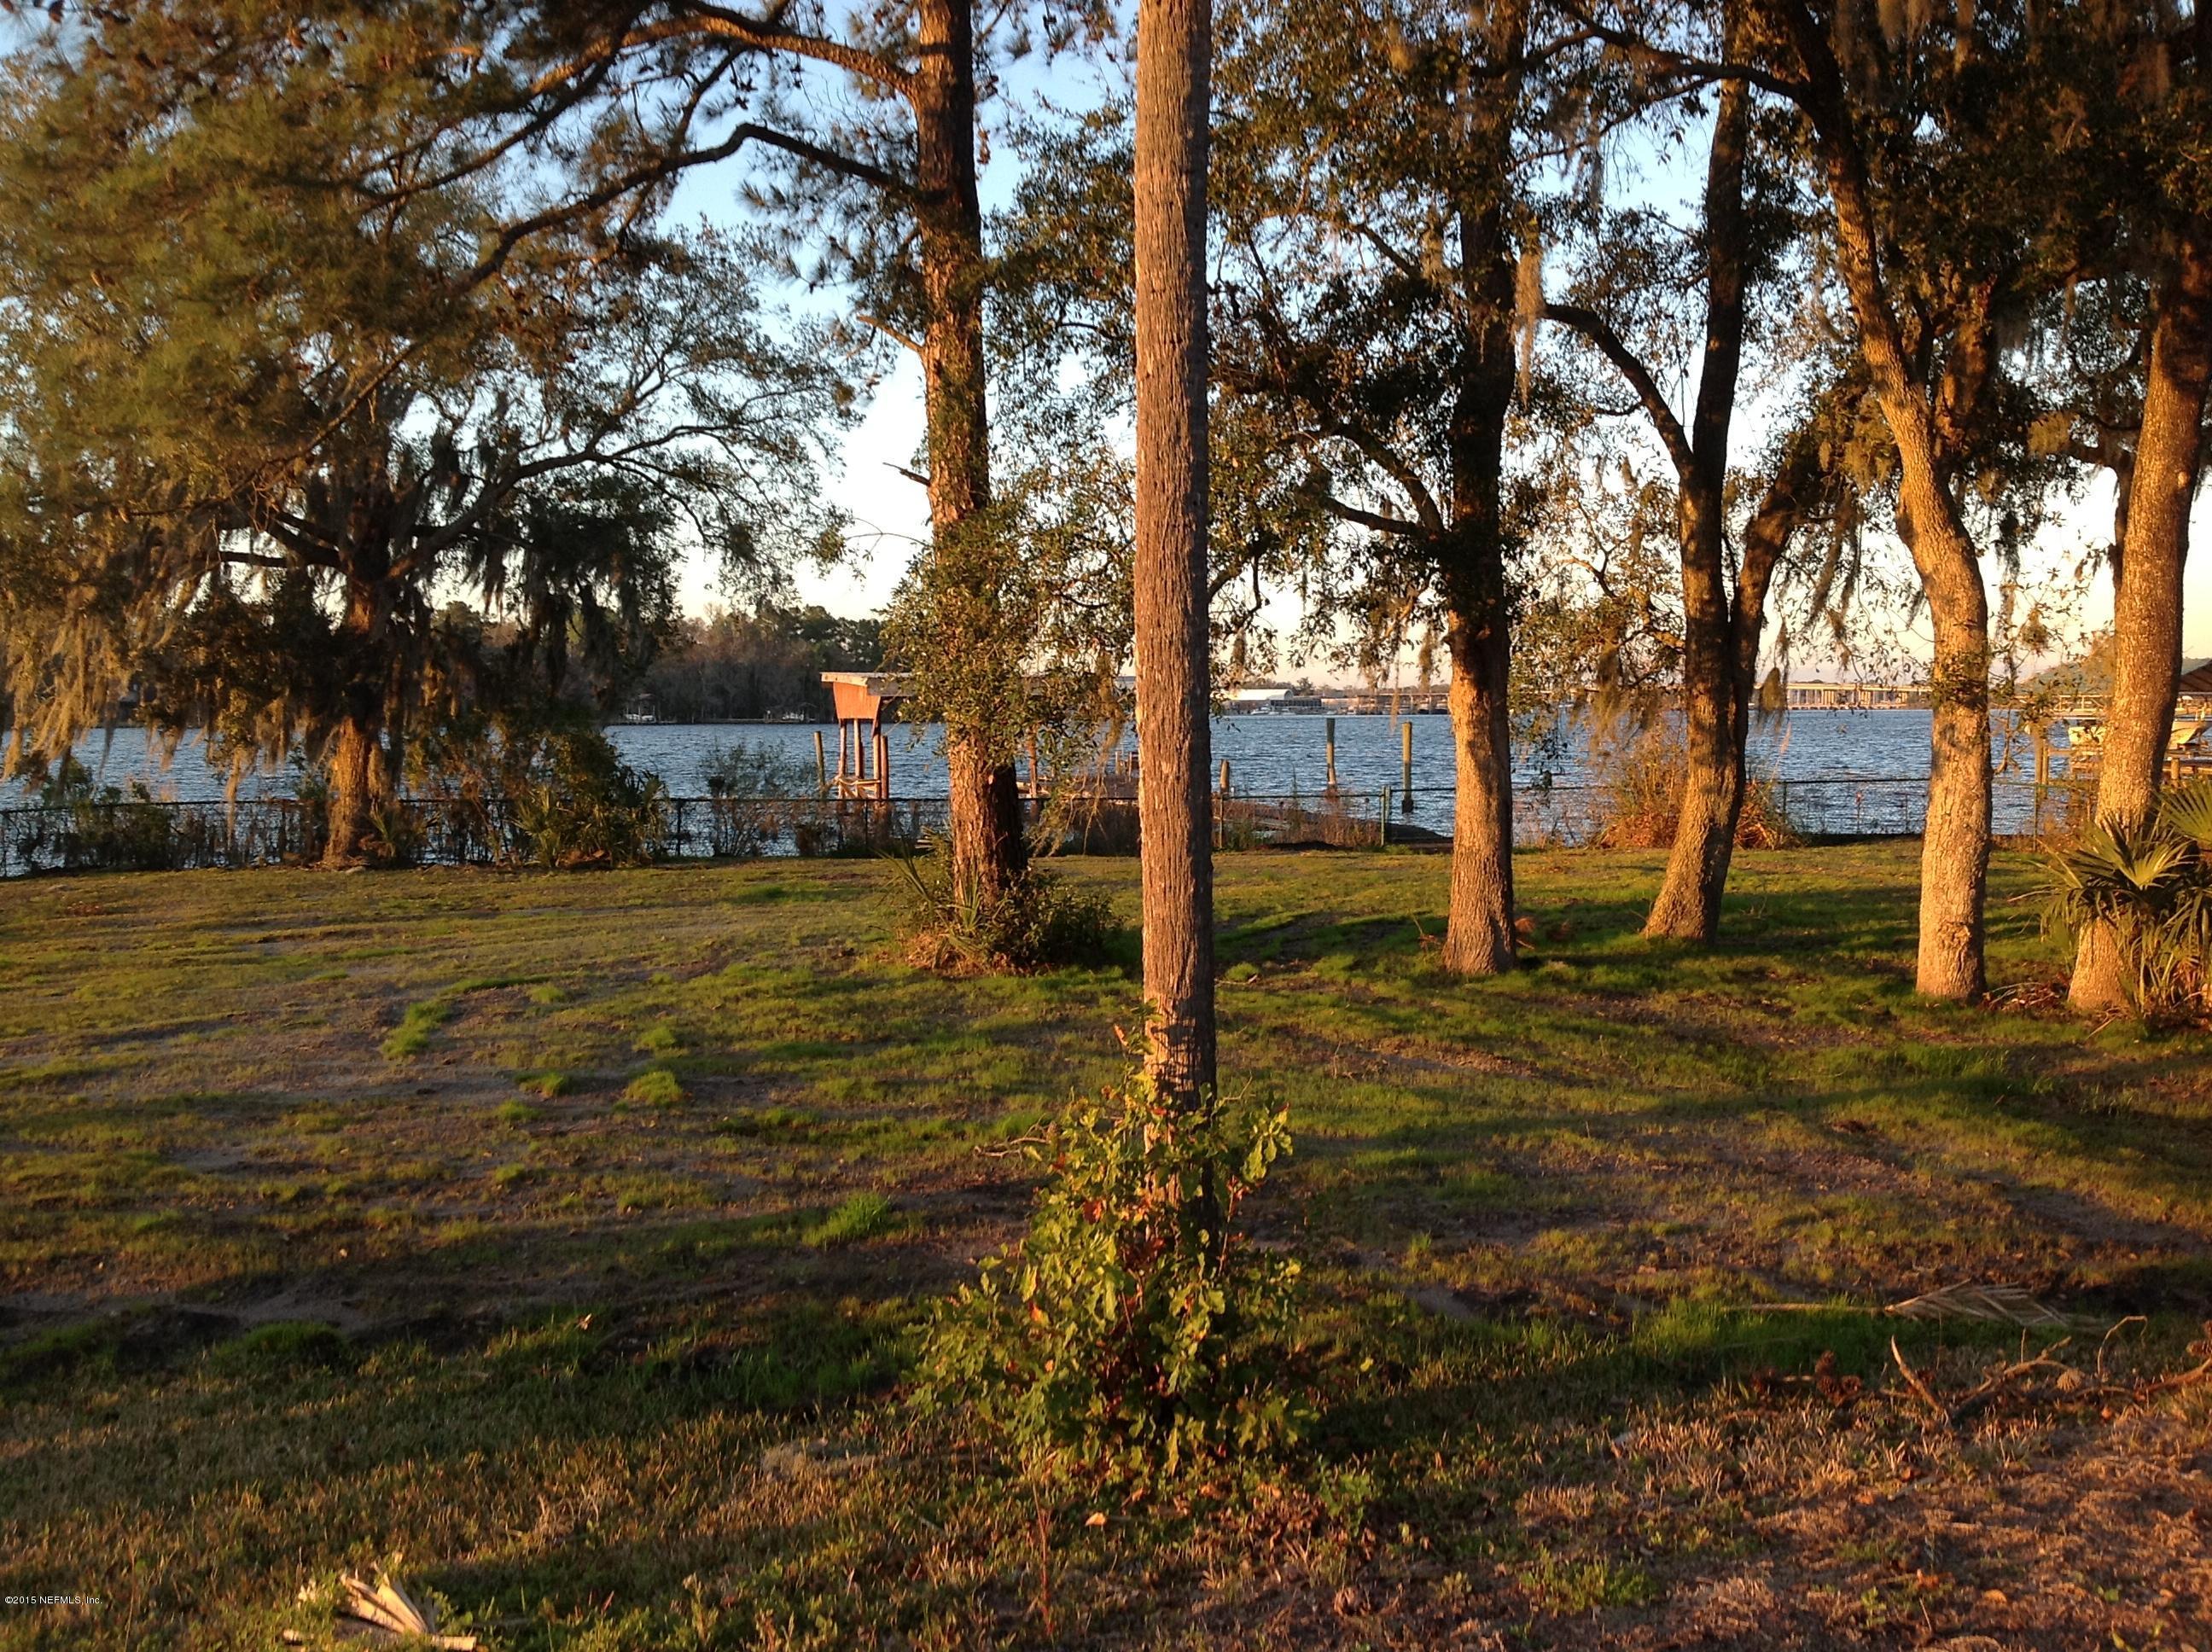 4343 ORTEGA FARMS, JACKSONVILLE, FLORIDA 32210, 1 Bedroom Bedrooms, ,1 BathroomBathrooms,Rental,For Rent,ORTEGA FARMS,1048819